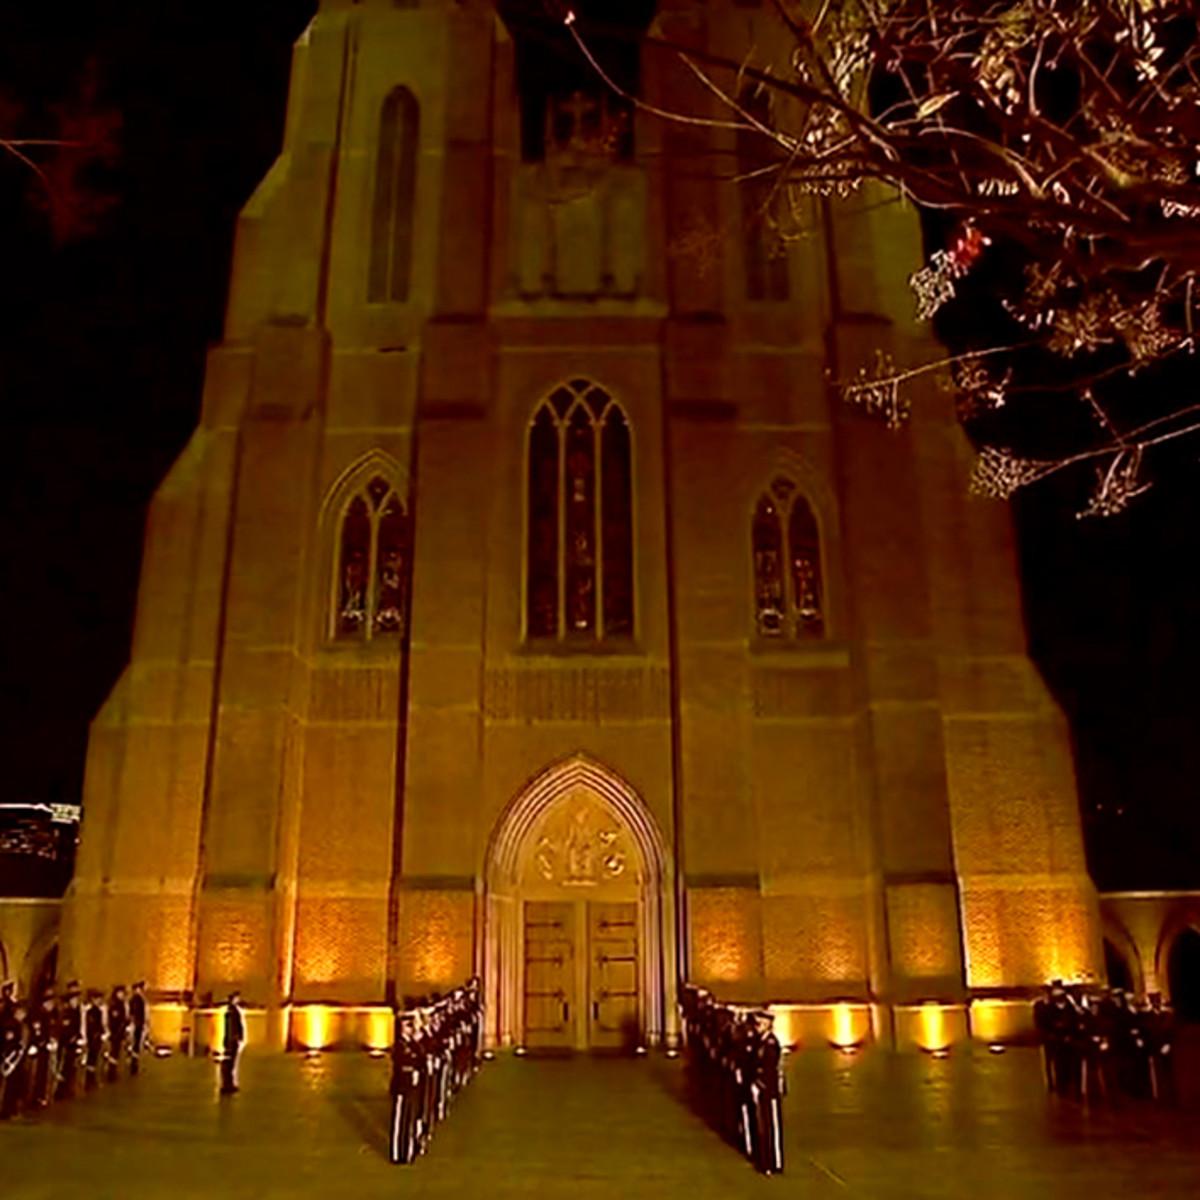 President George HW Bush St martin's church public visitation exterior